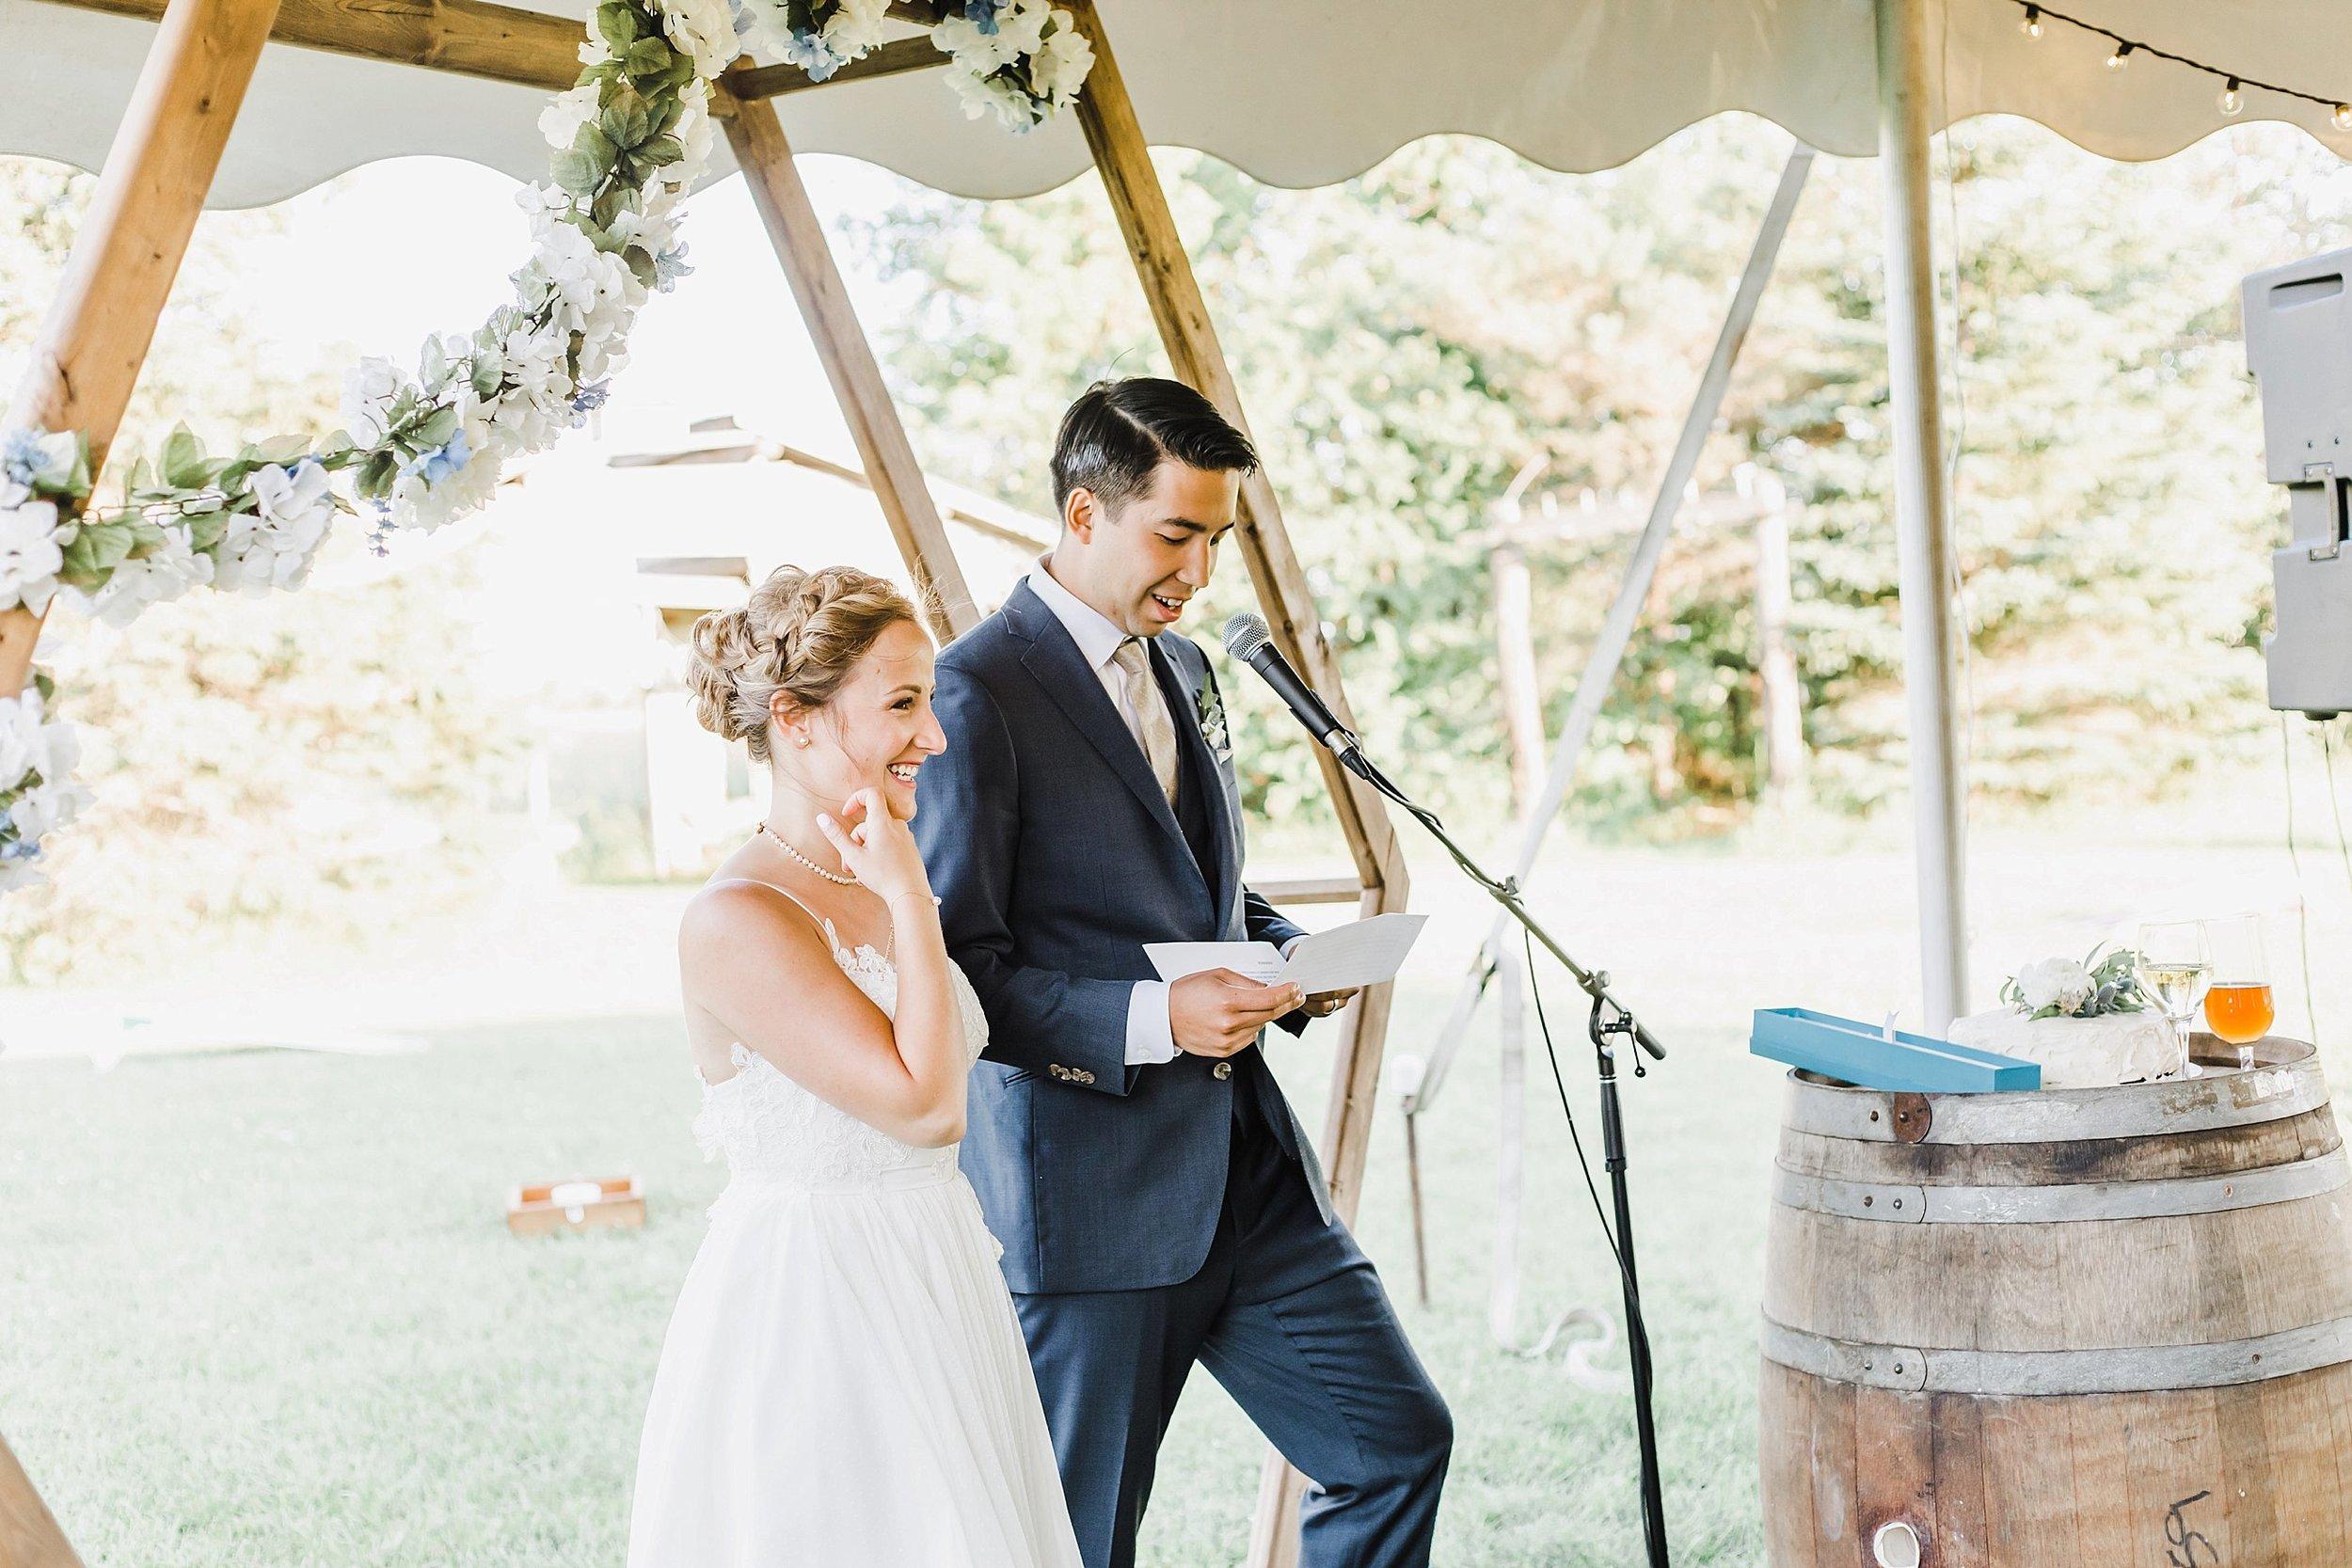 light airy indie fine art ottawa wedding photographer | Ali and Batoul Photography_0888.jpg